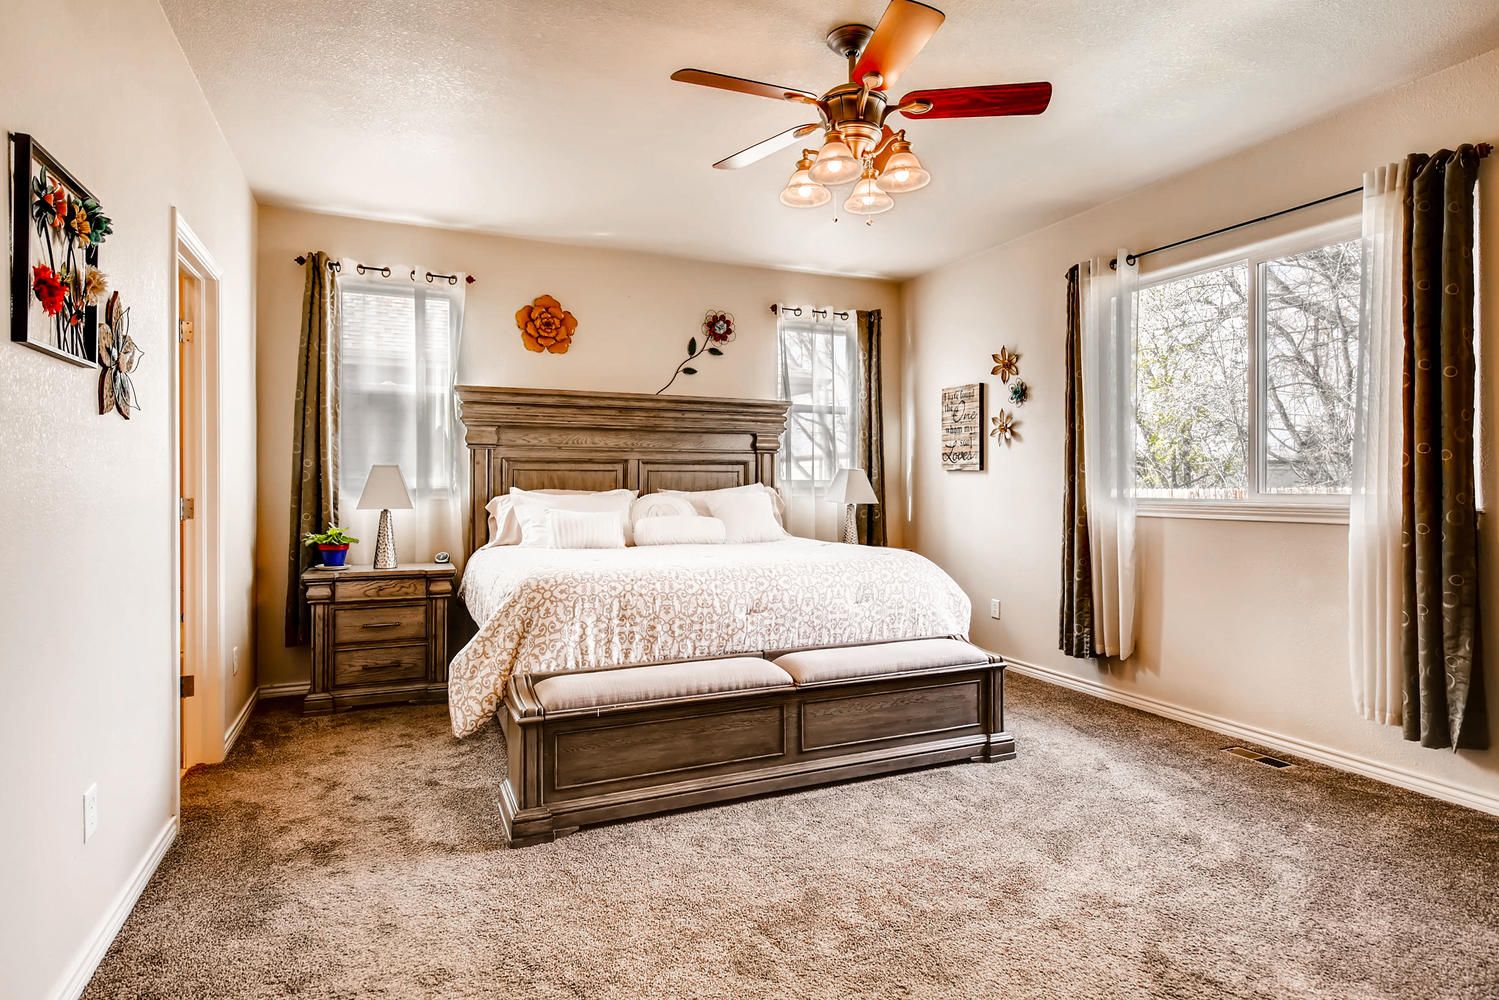 8690 W 49th Cir Arvada CO-large-012-26-Master Bedroom-1500x1000-72dpi.jpg